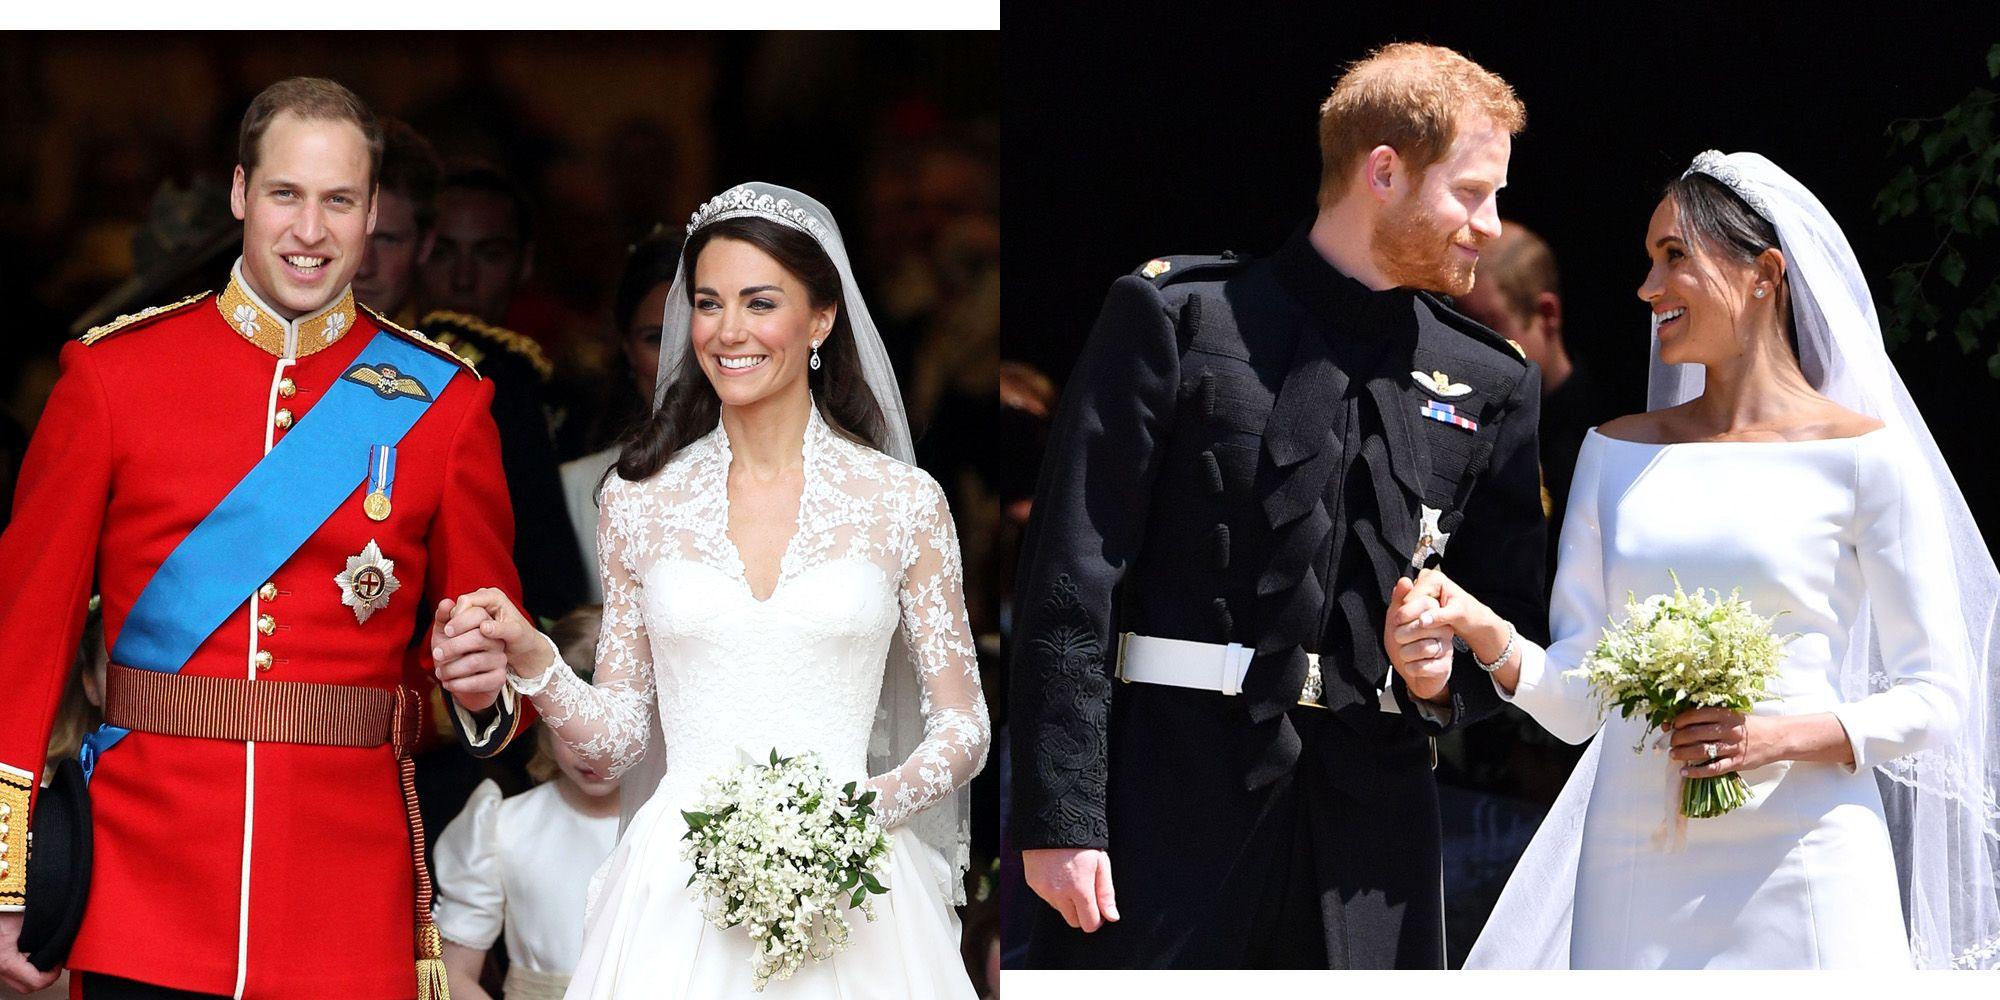 Royal Wedding Bad Lip Reading.Top Five Esquire Royal Wedding Bad Lip Reading Circus